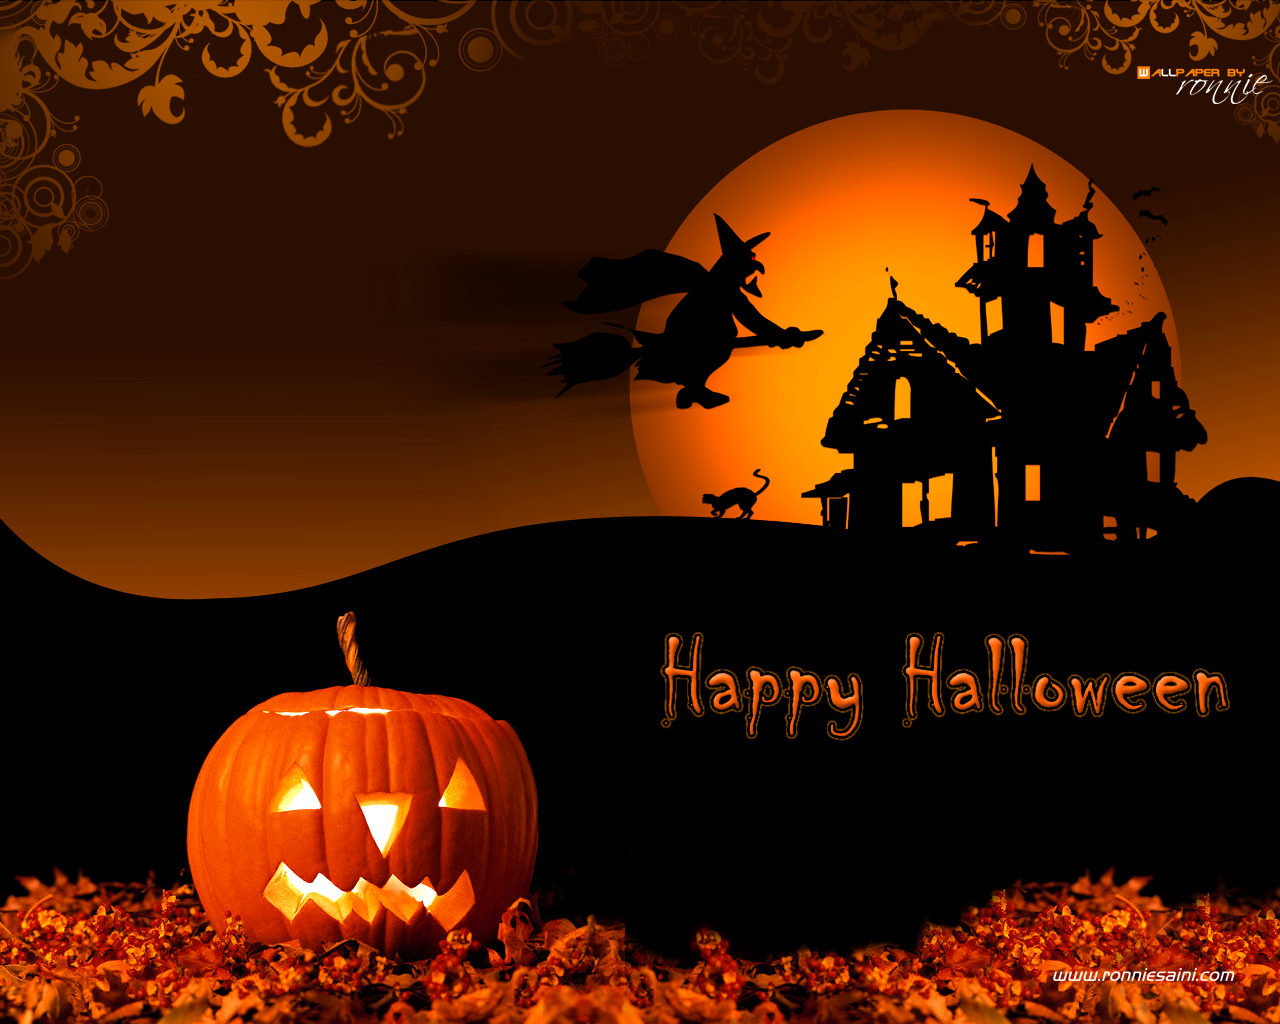 Halloween Wallpaper Free - WallpaperSafari